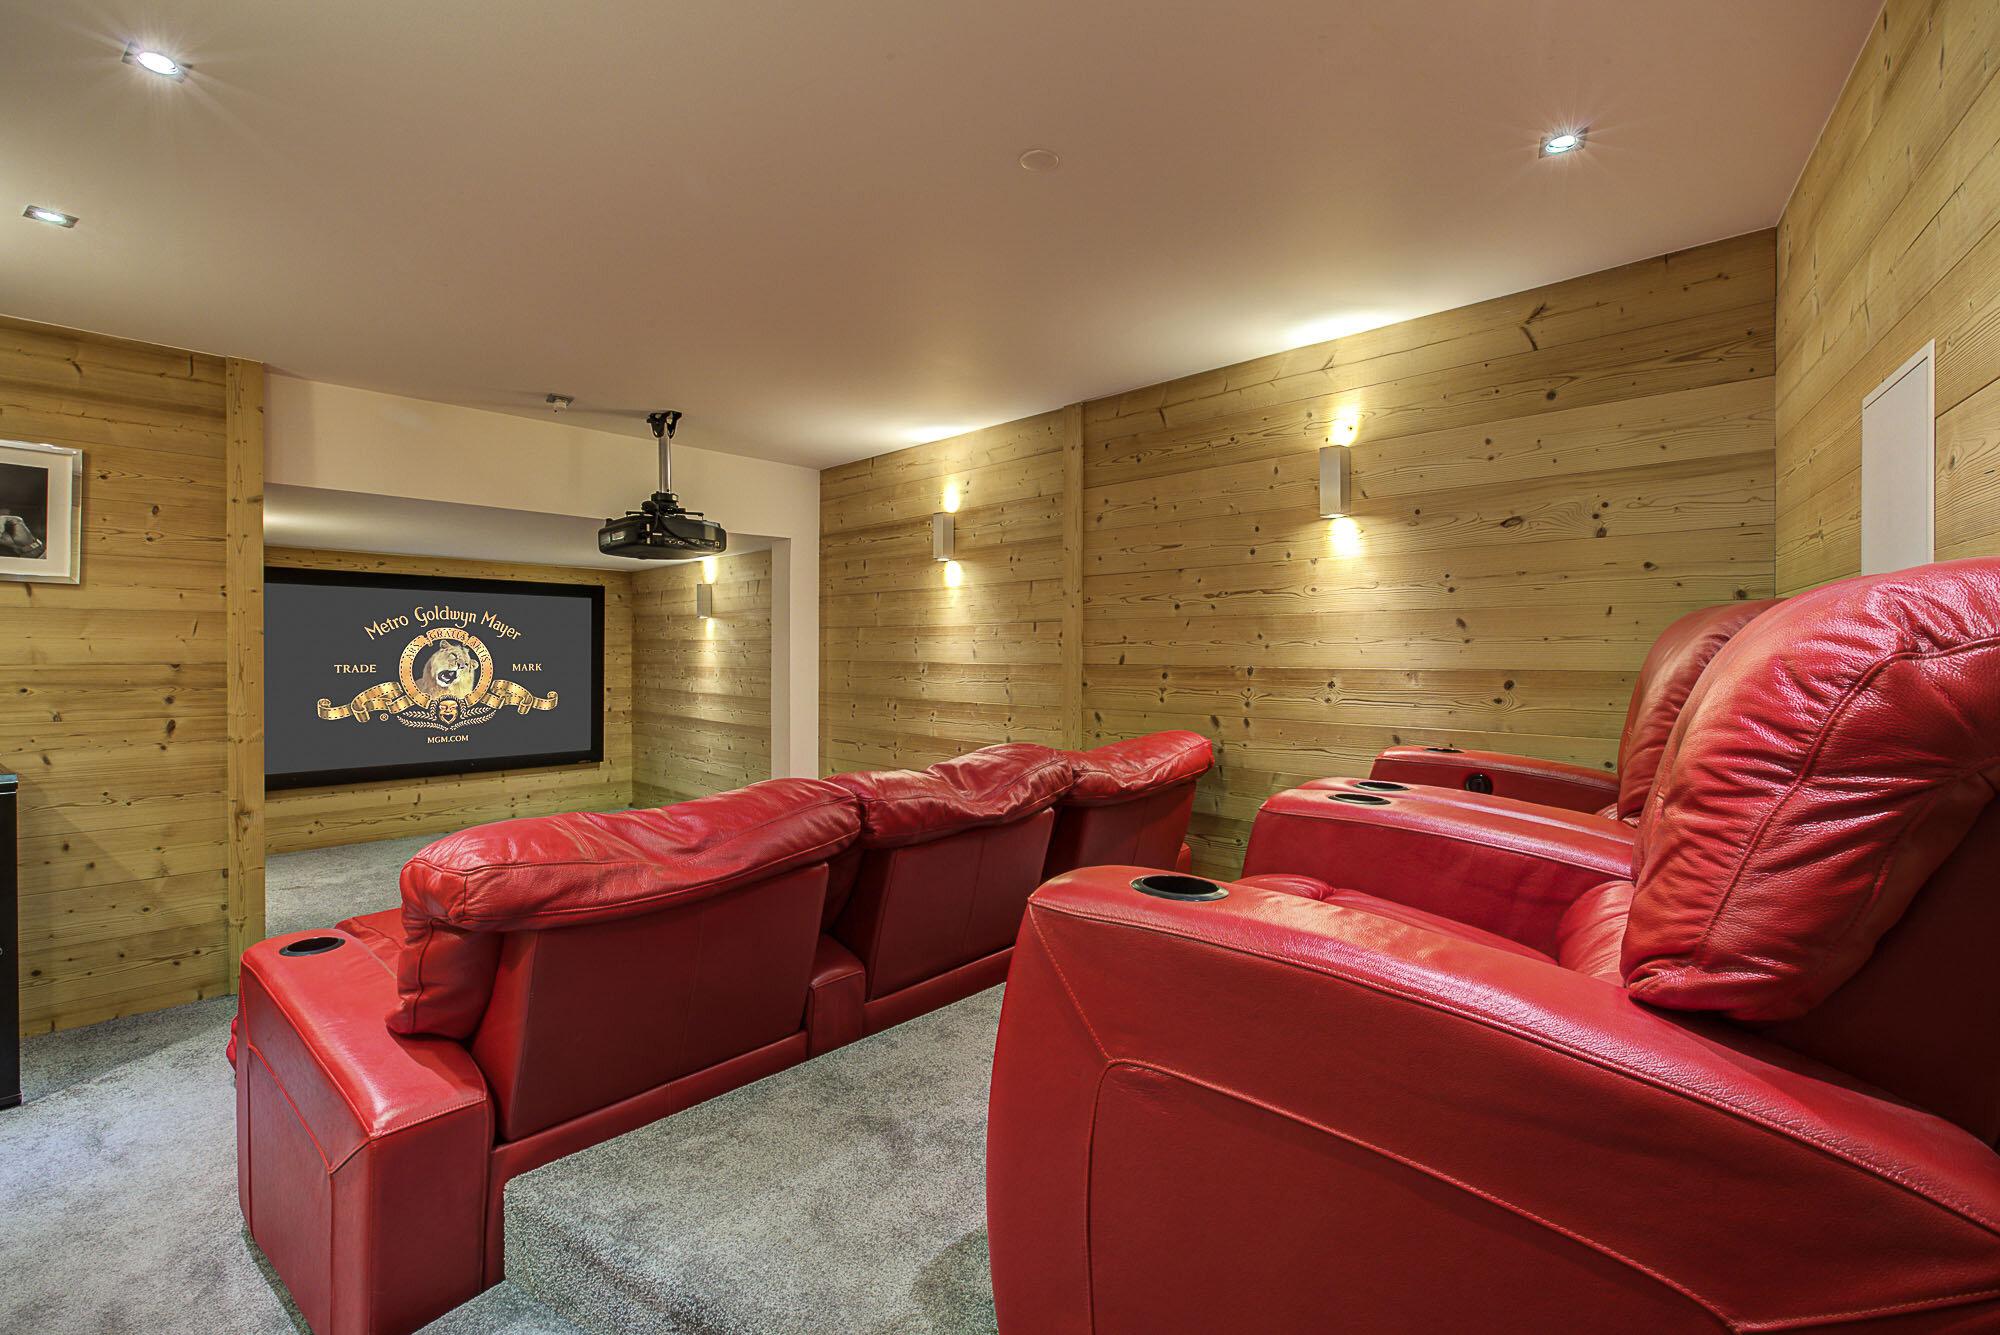 tg-ski-luxury-chalet-bouquetin-morzine-cinema-room-012.jpg